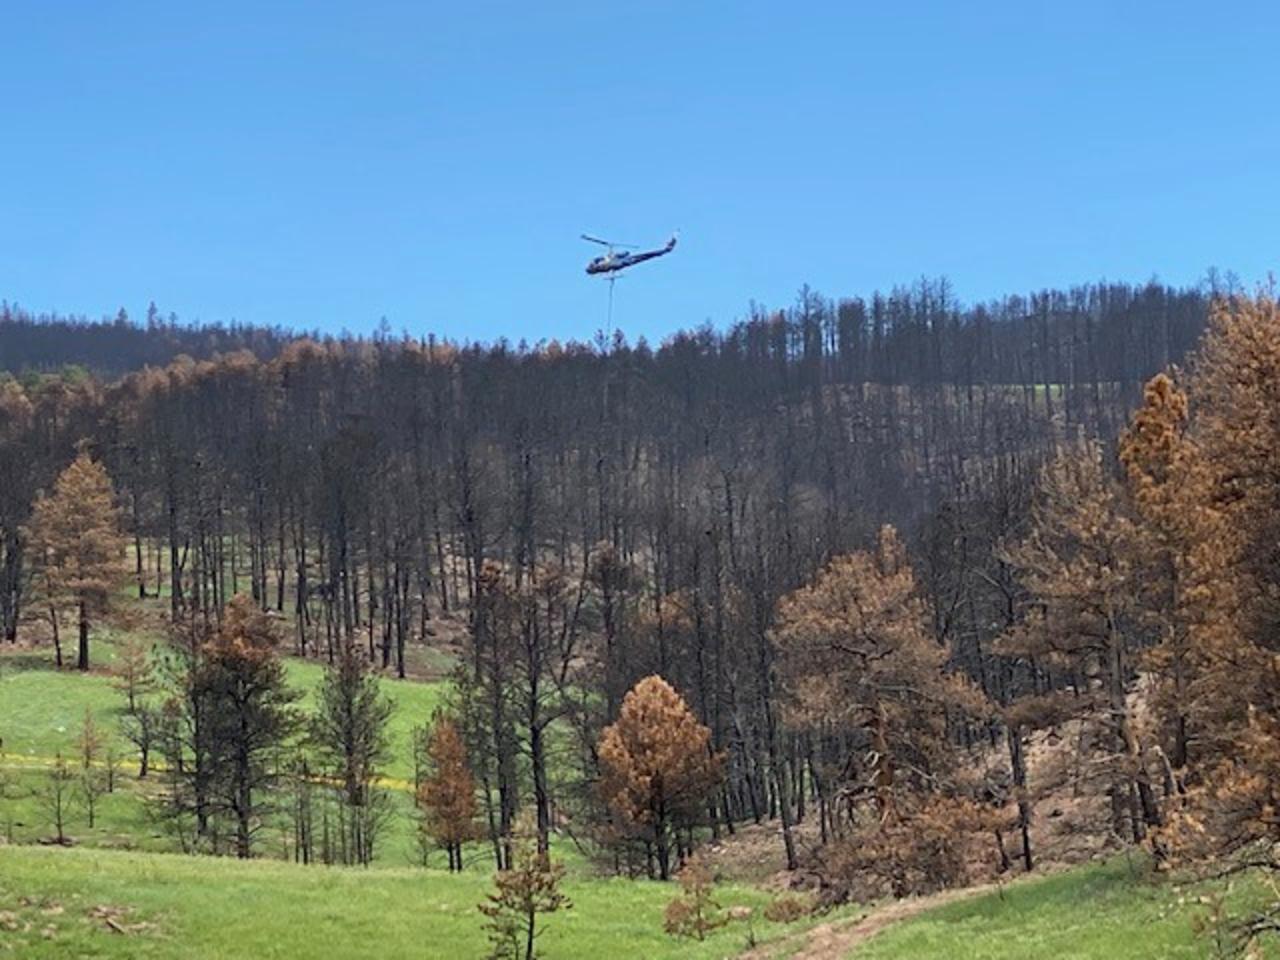 Ecologist: Intense fires like Calwood endanger regeneration prospects for ponderosa pine forest